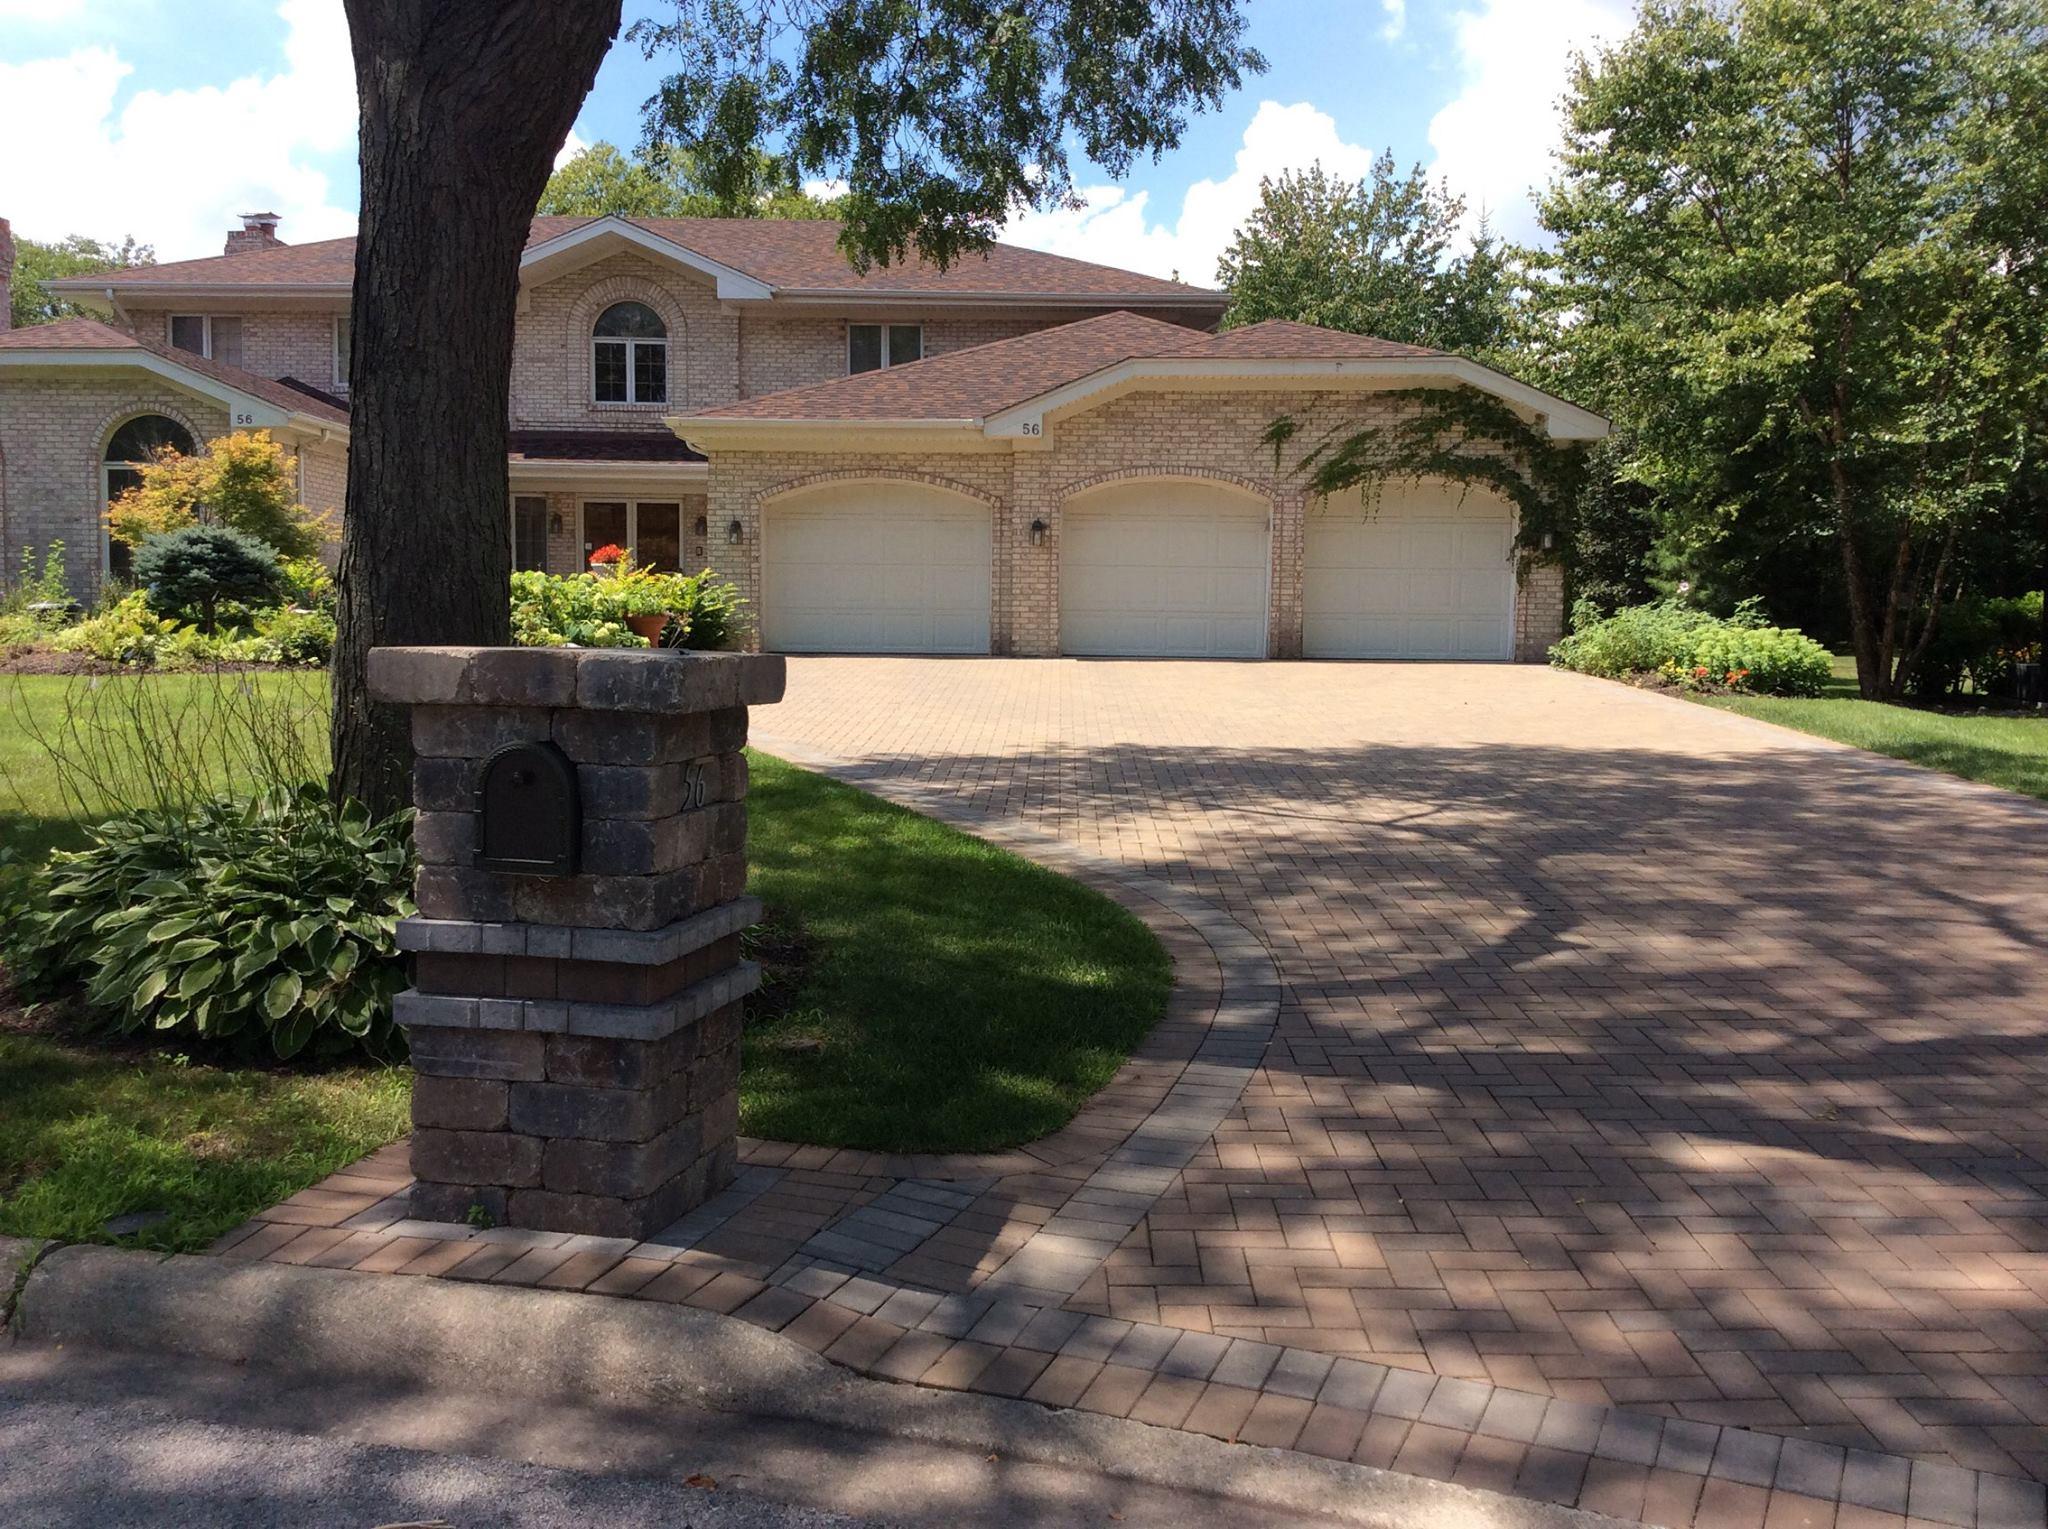 Landscape construction - brick driveway in Oswego, Illinois